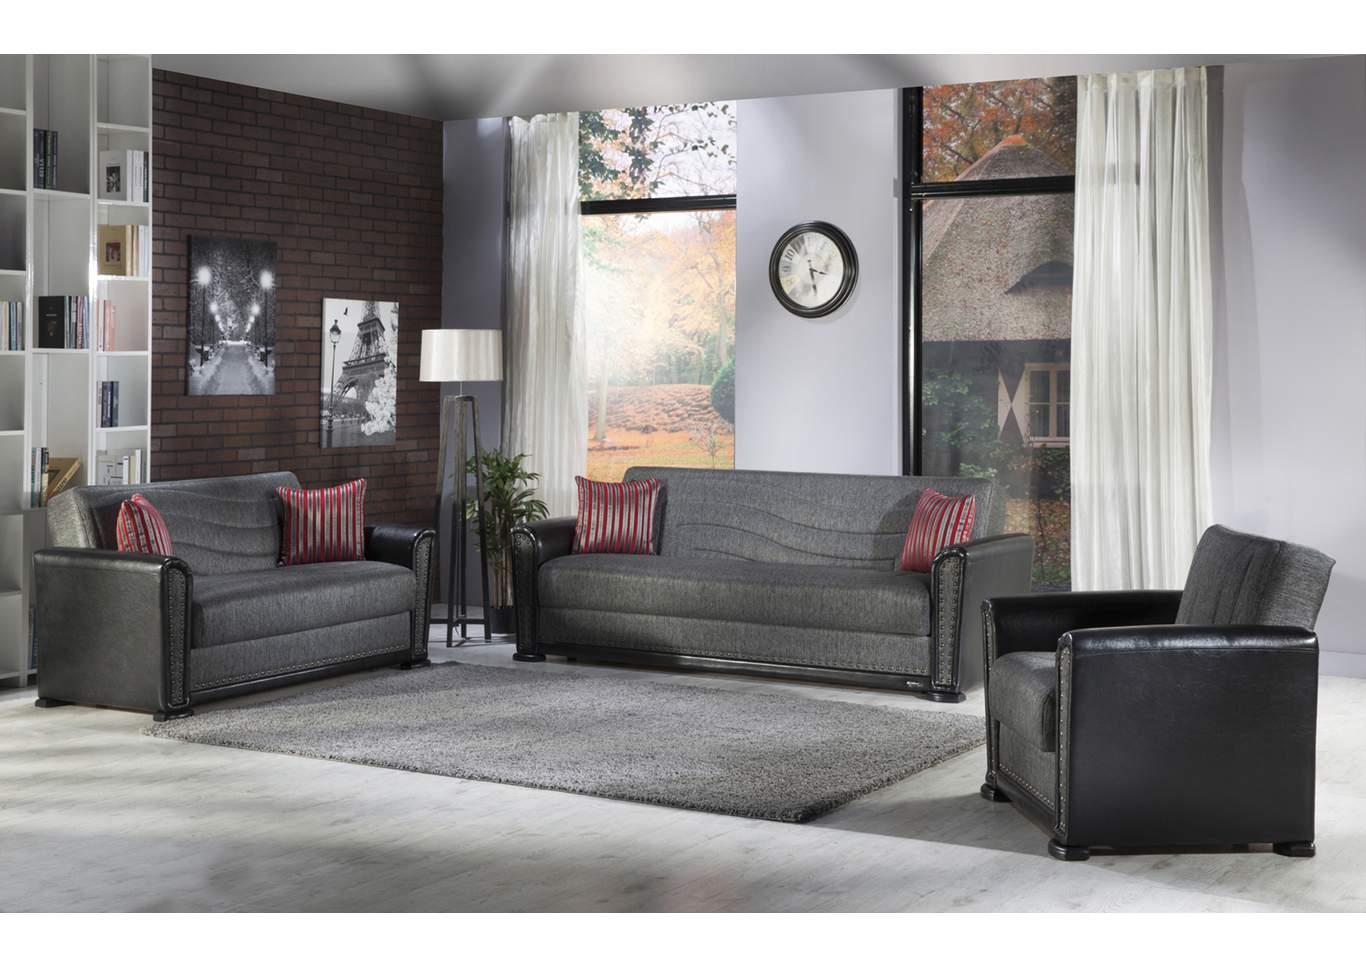 Astonishing Direct Home Furniture Nj Alfa Redeyef Fume Sofa Loveseat Unemploymentrelief Wooden Chair Designs For Living Room Unemploymentrelieforg